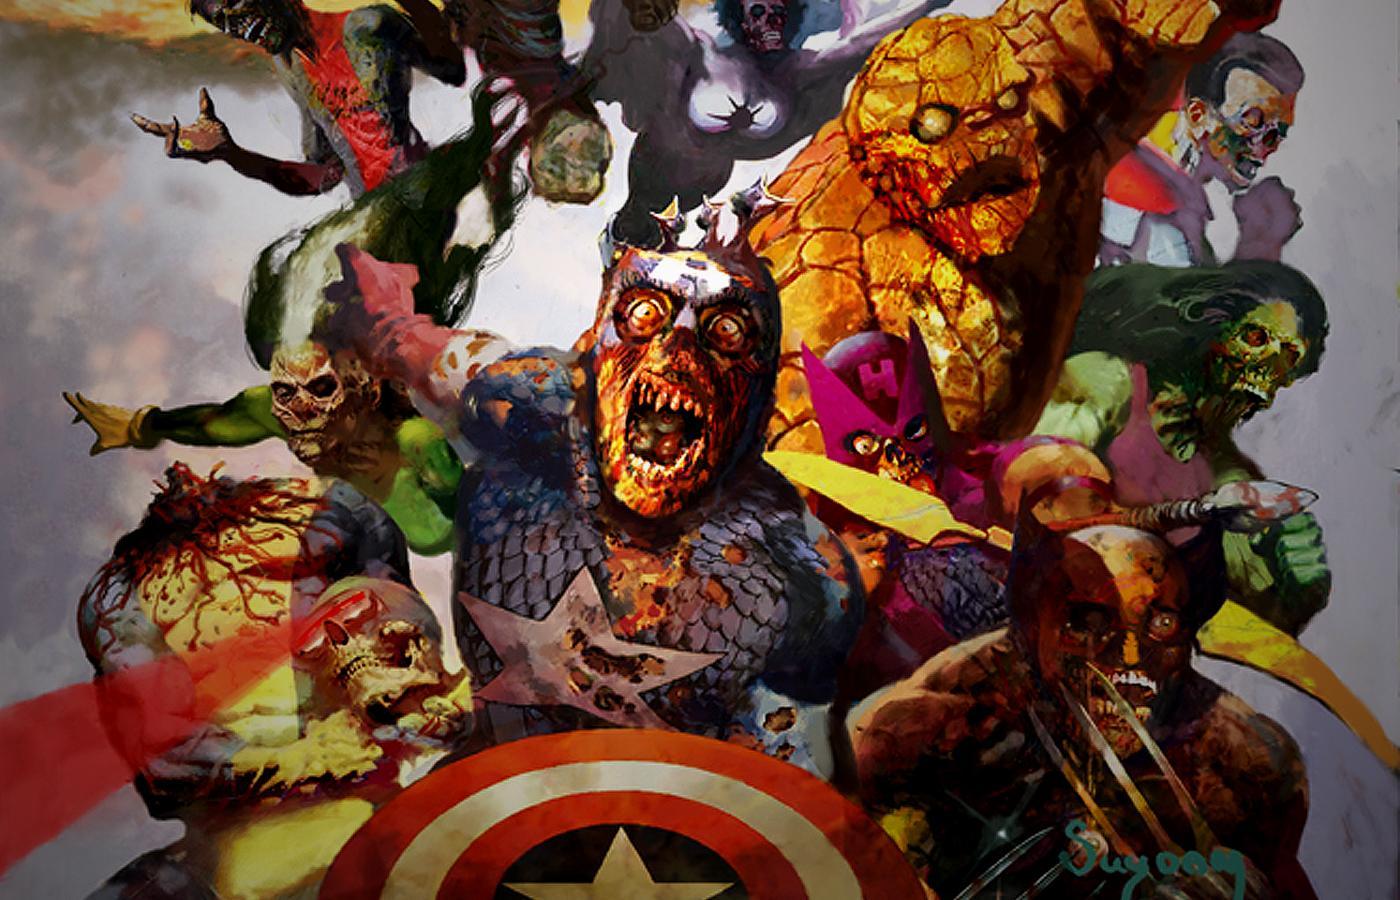 halloween-wallpaper-marvel-zombies-secret-war-zombies jpgZombies Wallpaper